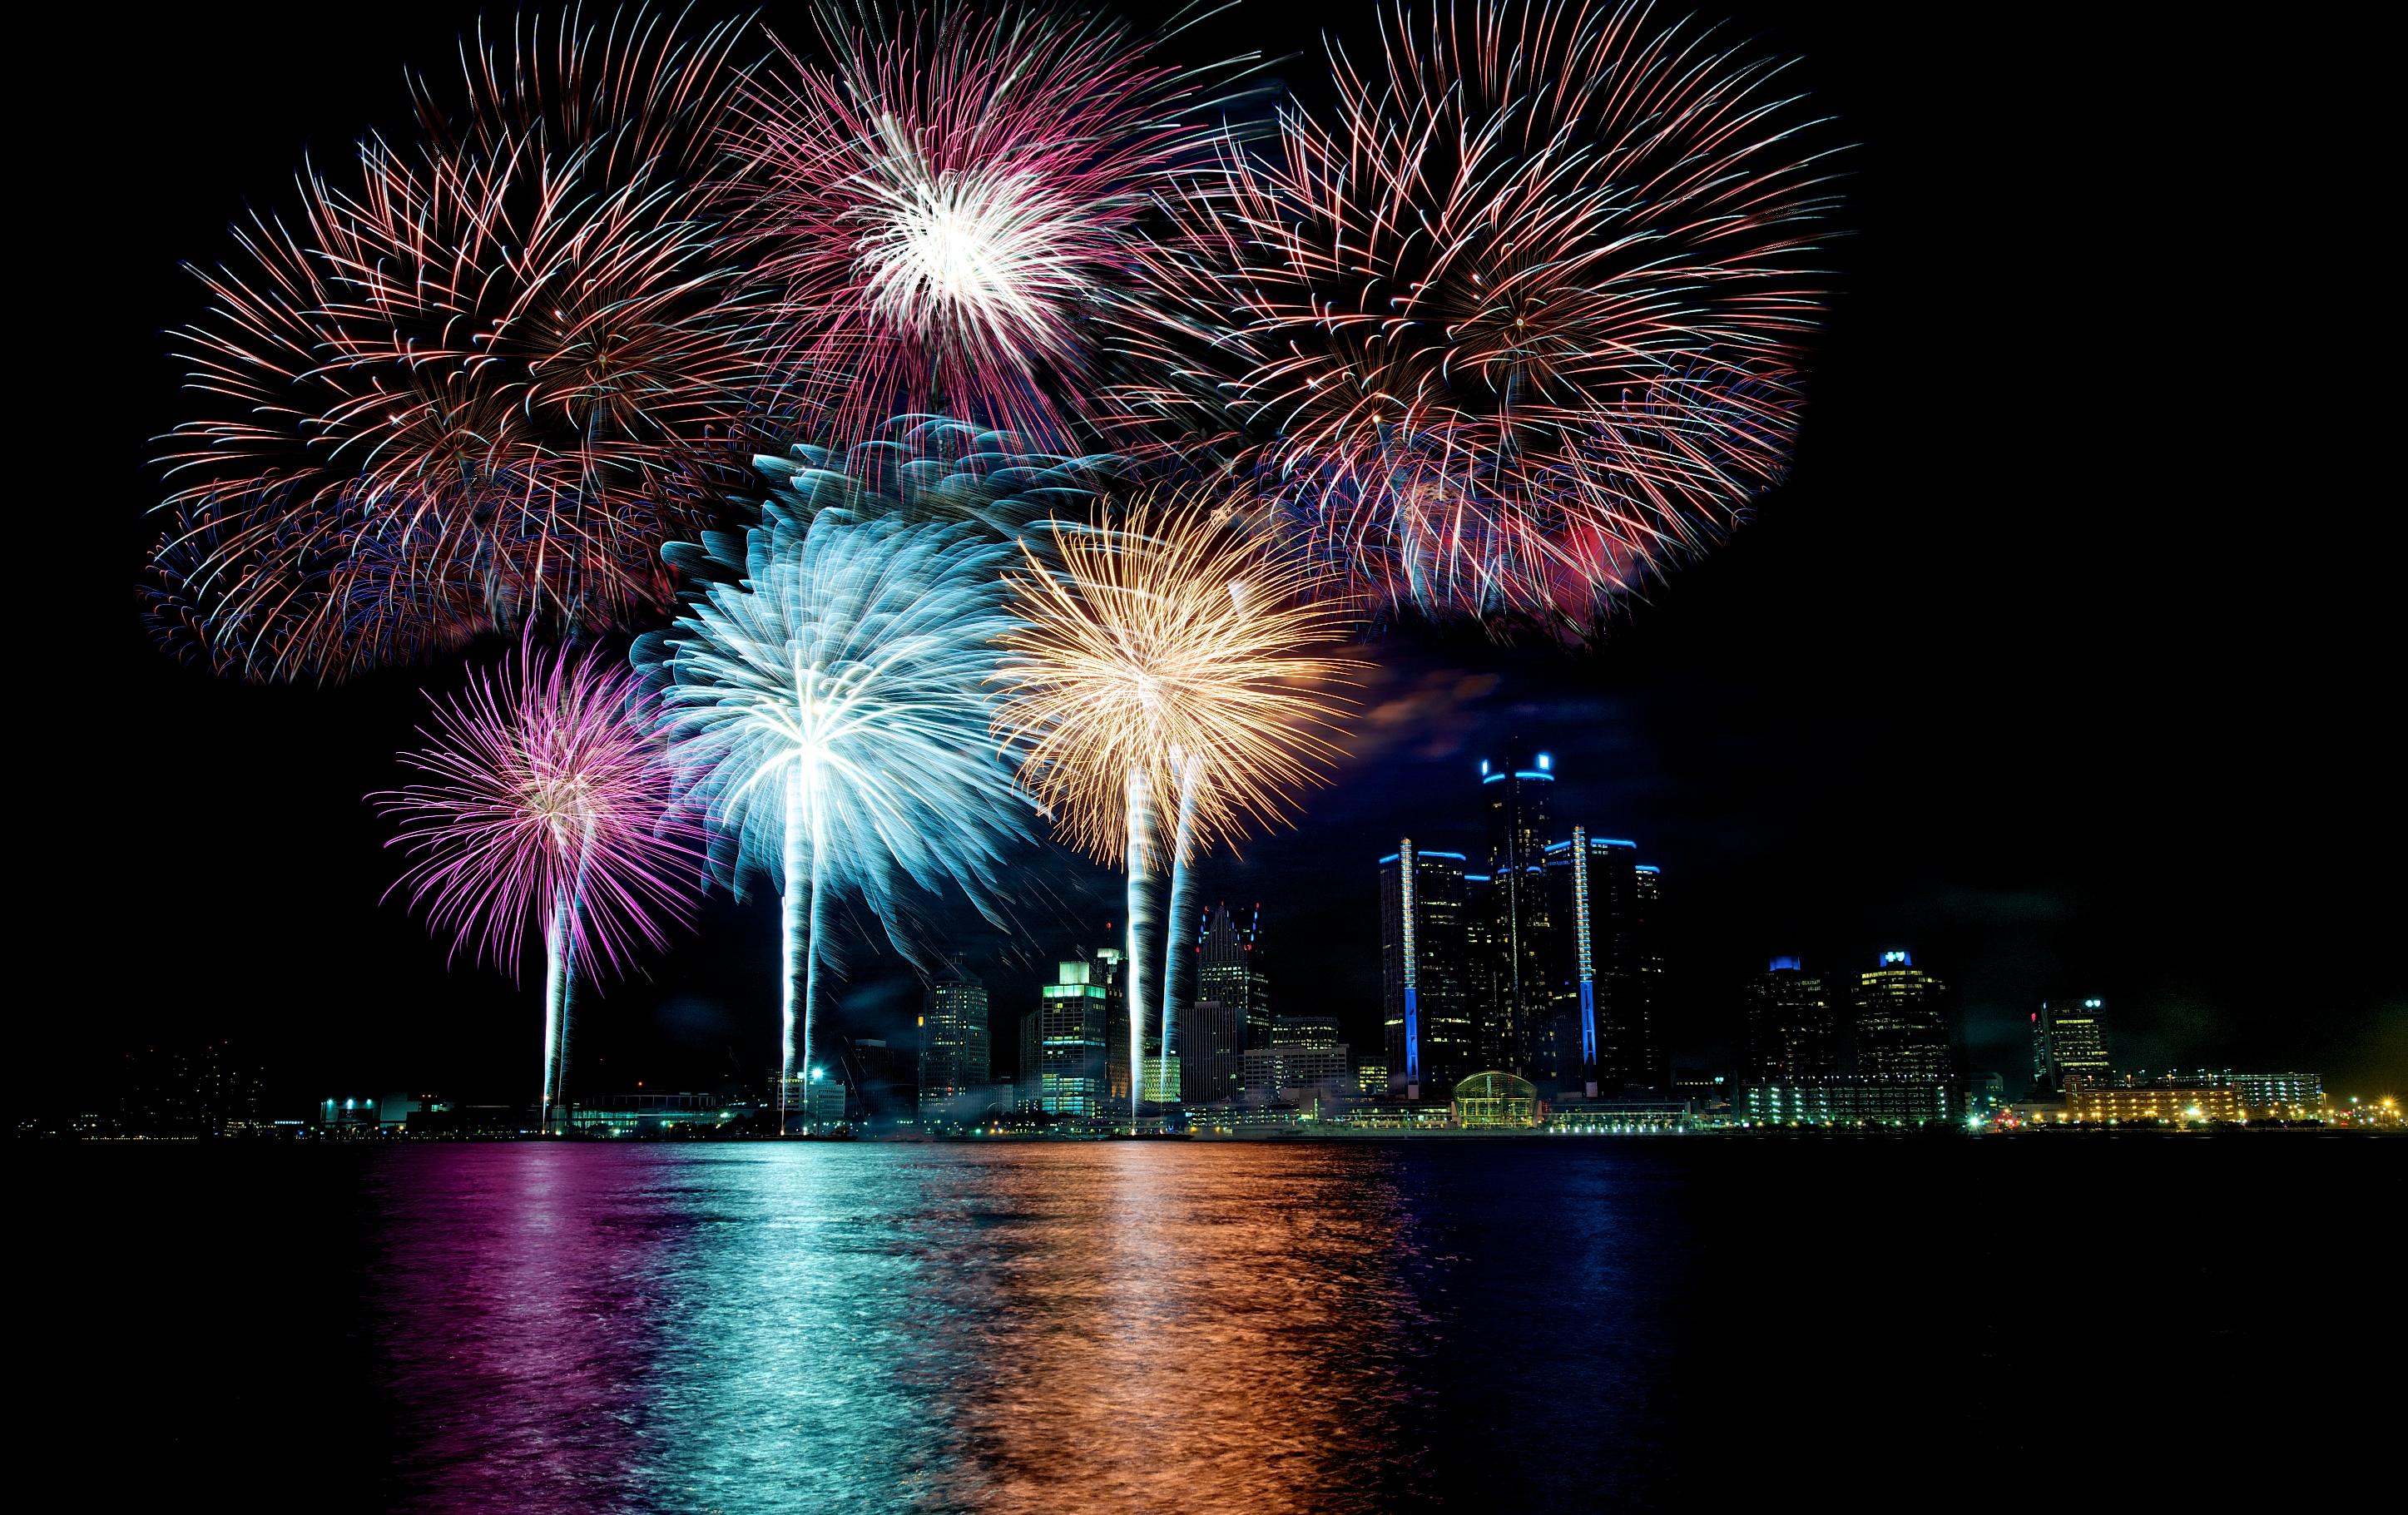 park city longexposure Ontario Canada water skyline rocks fireworks Detroit windsor crowds detroitriver 55thanniversary nikond600 bertweeksmemorialgardens